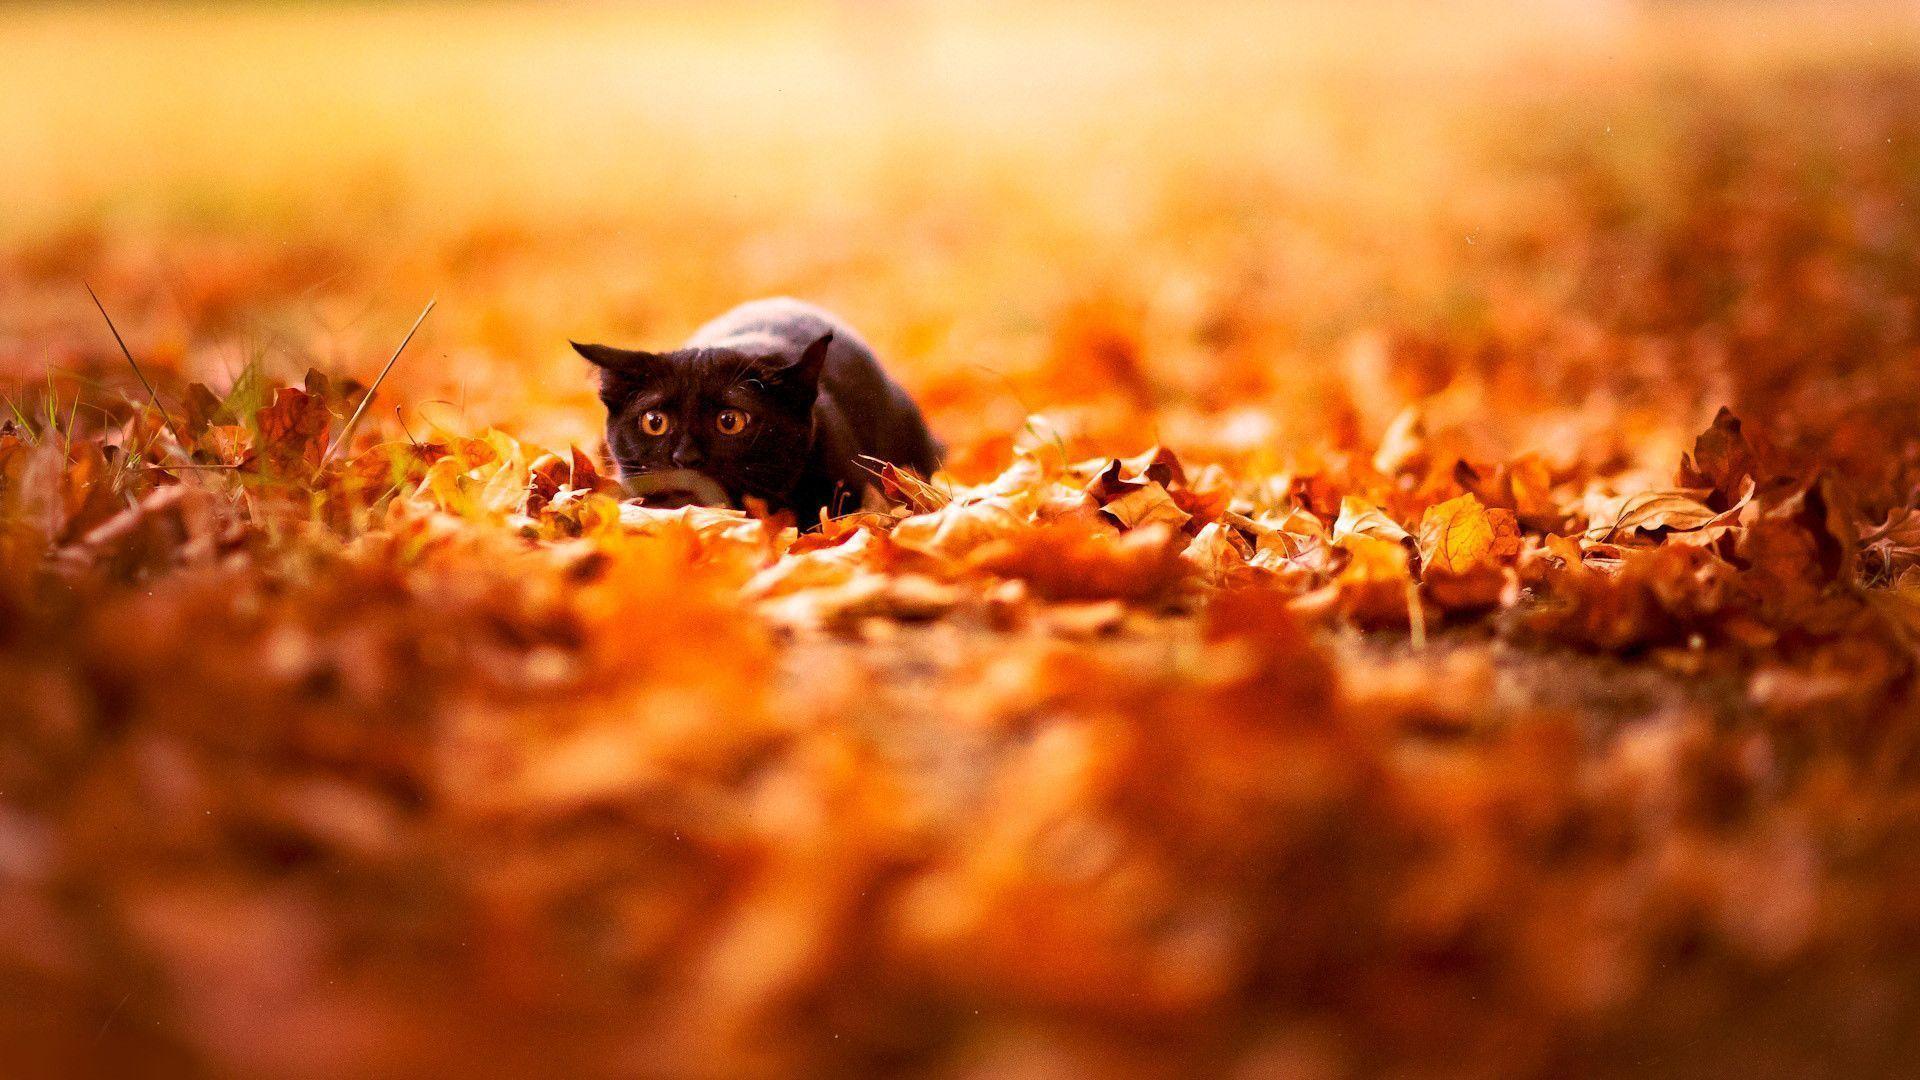 autumn leaves desktop wallpaper wallpaper autumn leaves desktop